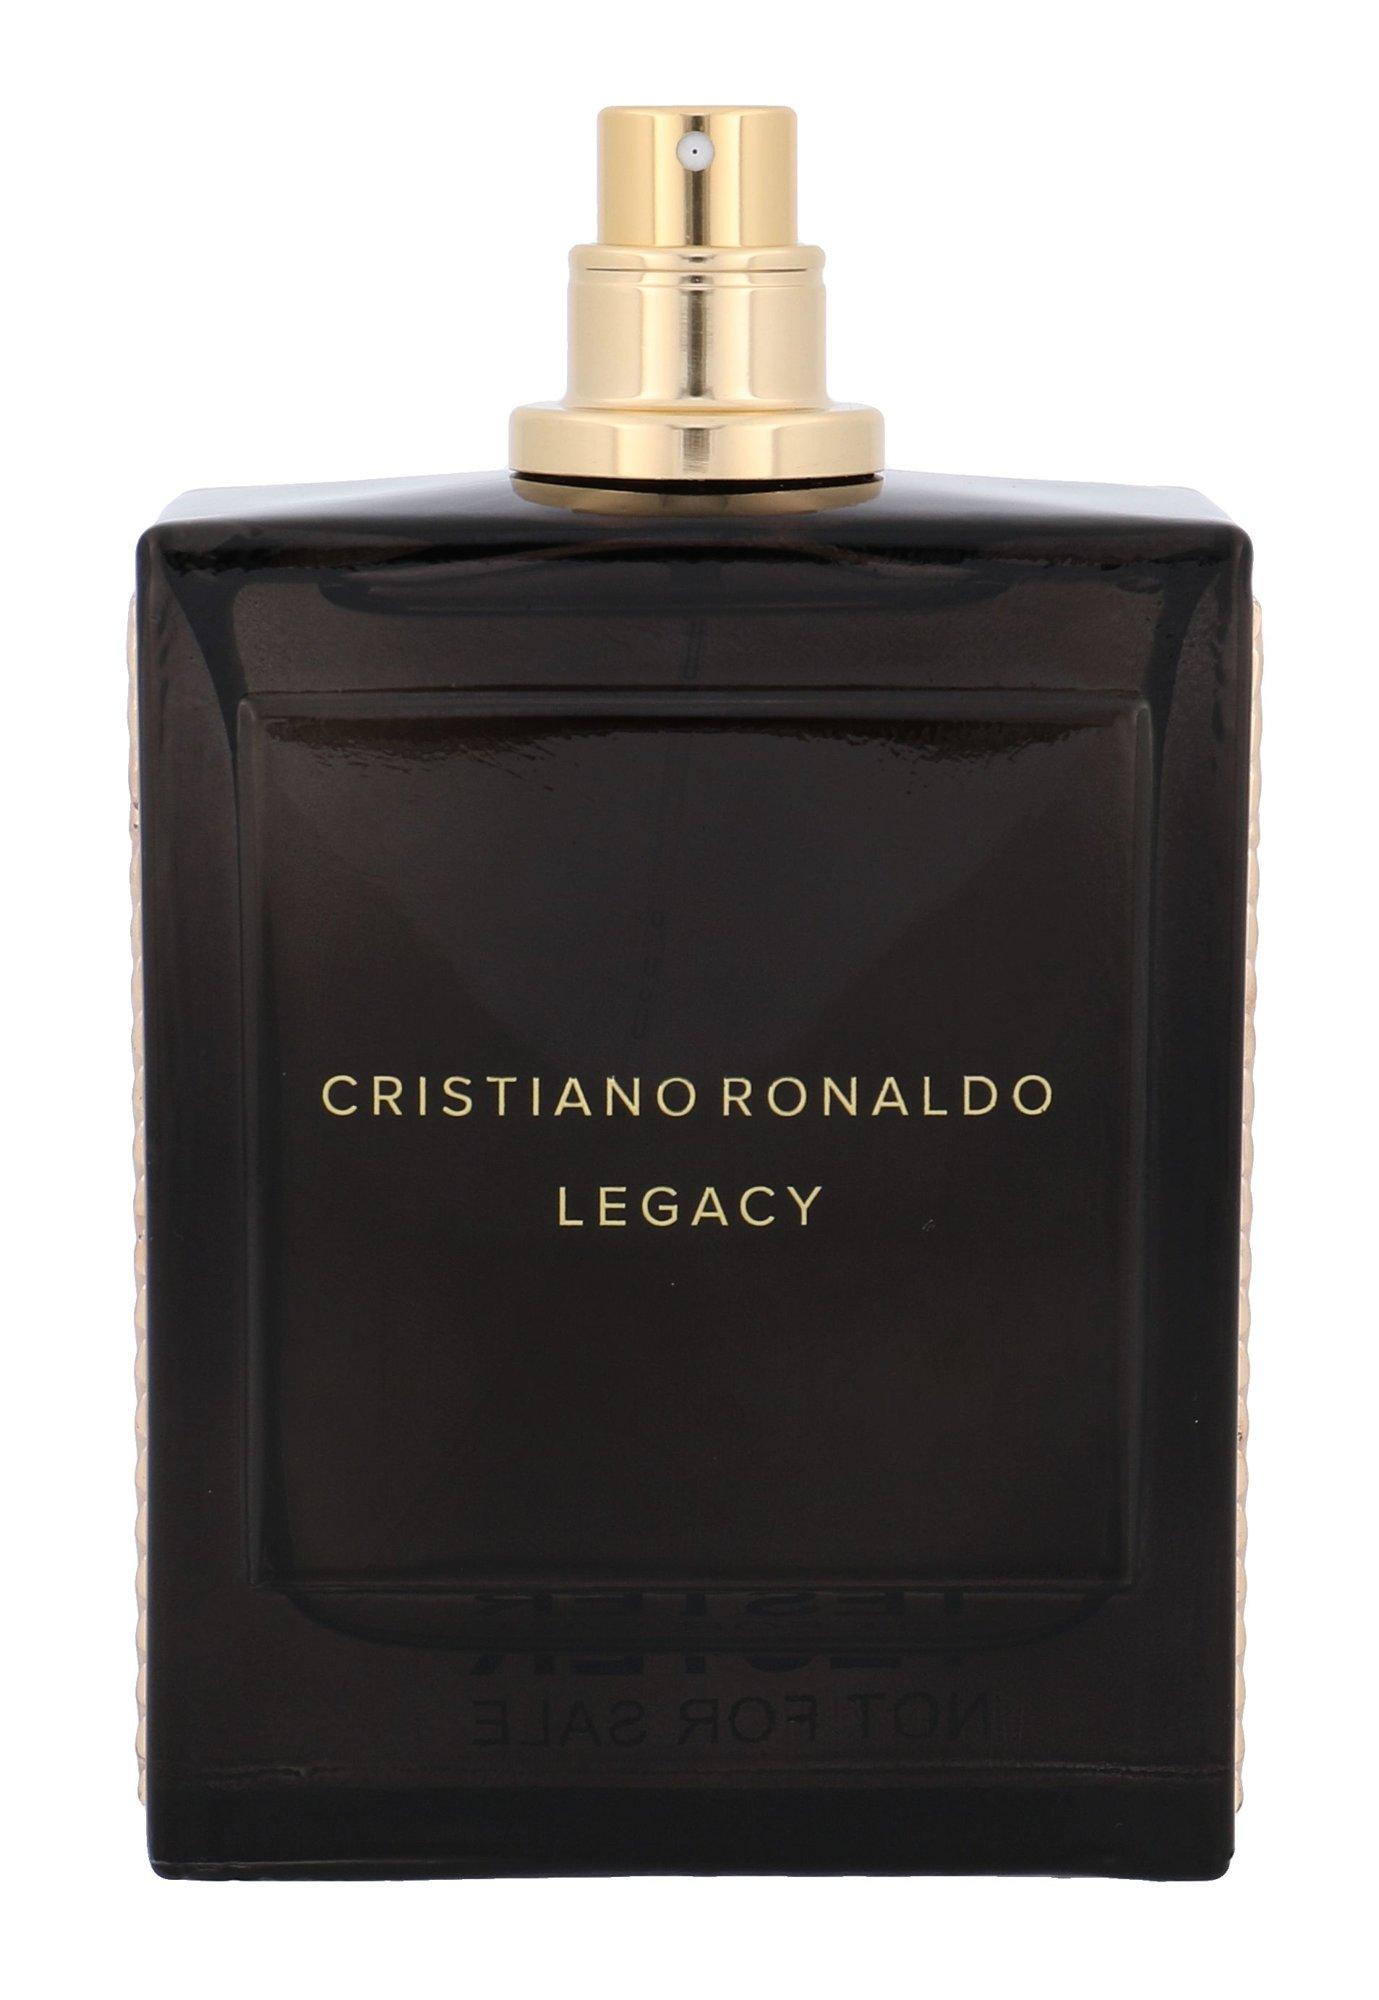 Cristiano Ronaldo Legacy EDT 100ml